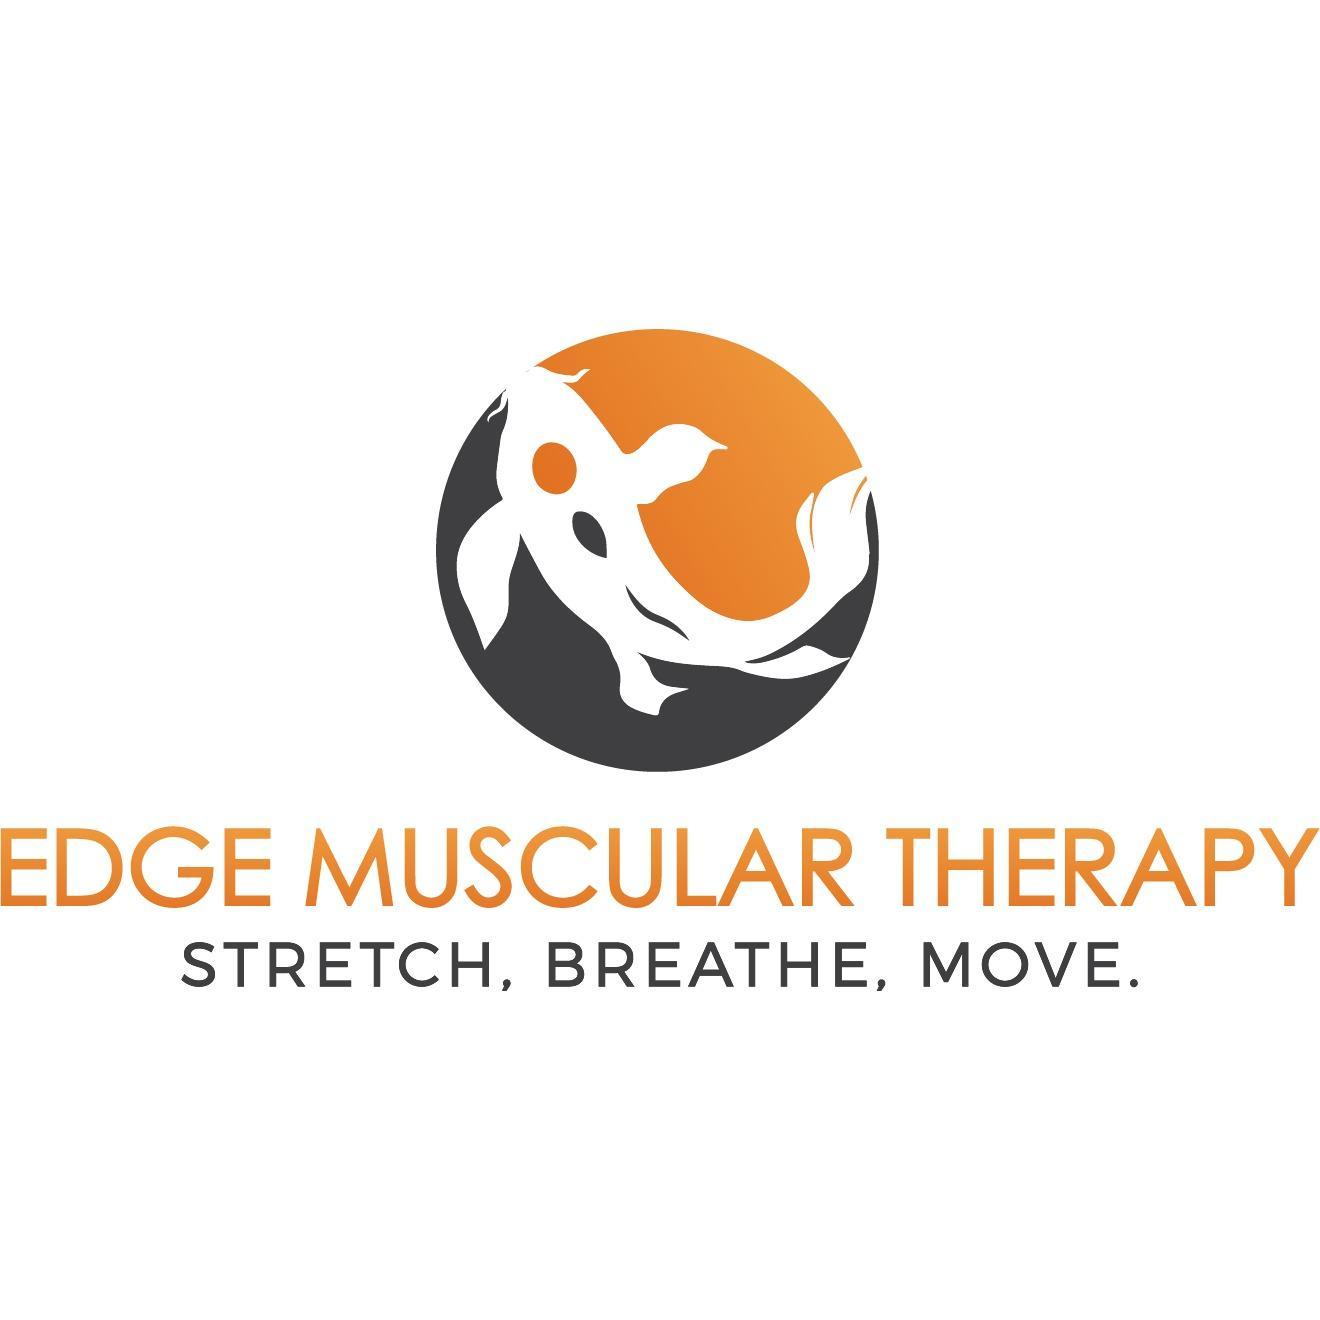 Edge Muscular Therapy - San Antonio, TX 78209 - (719)246-0031 | ShowMeLocal.com